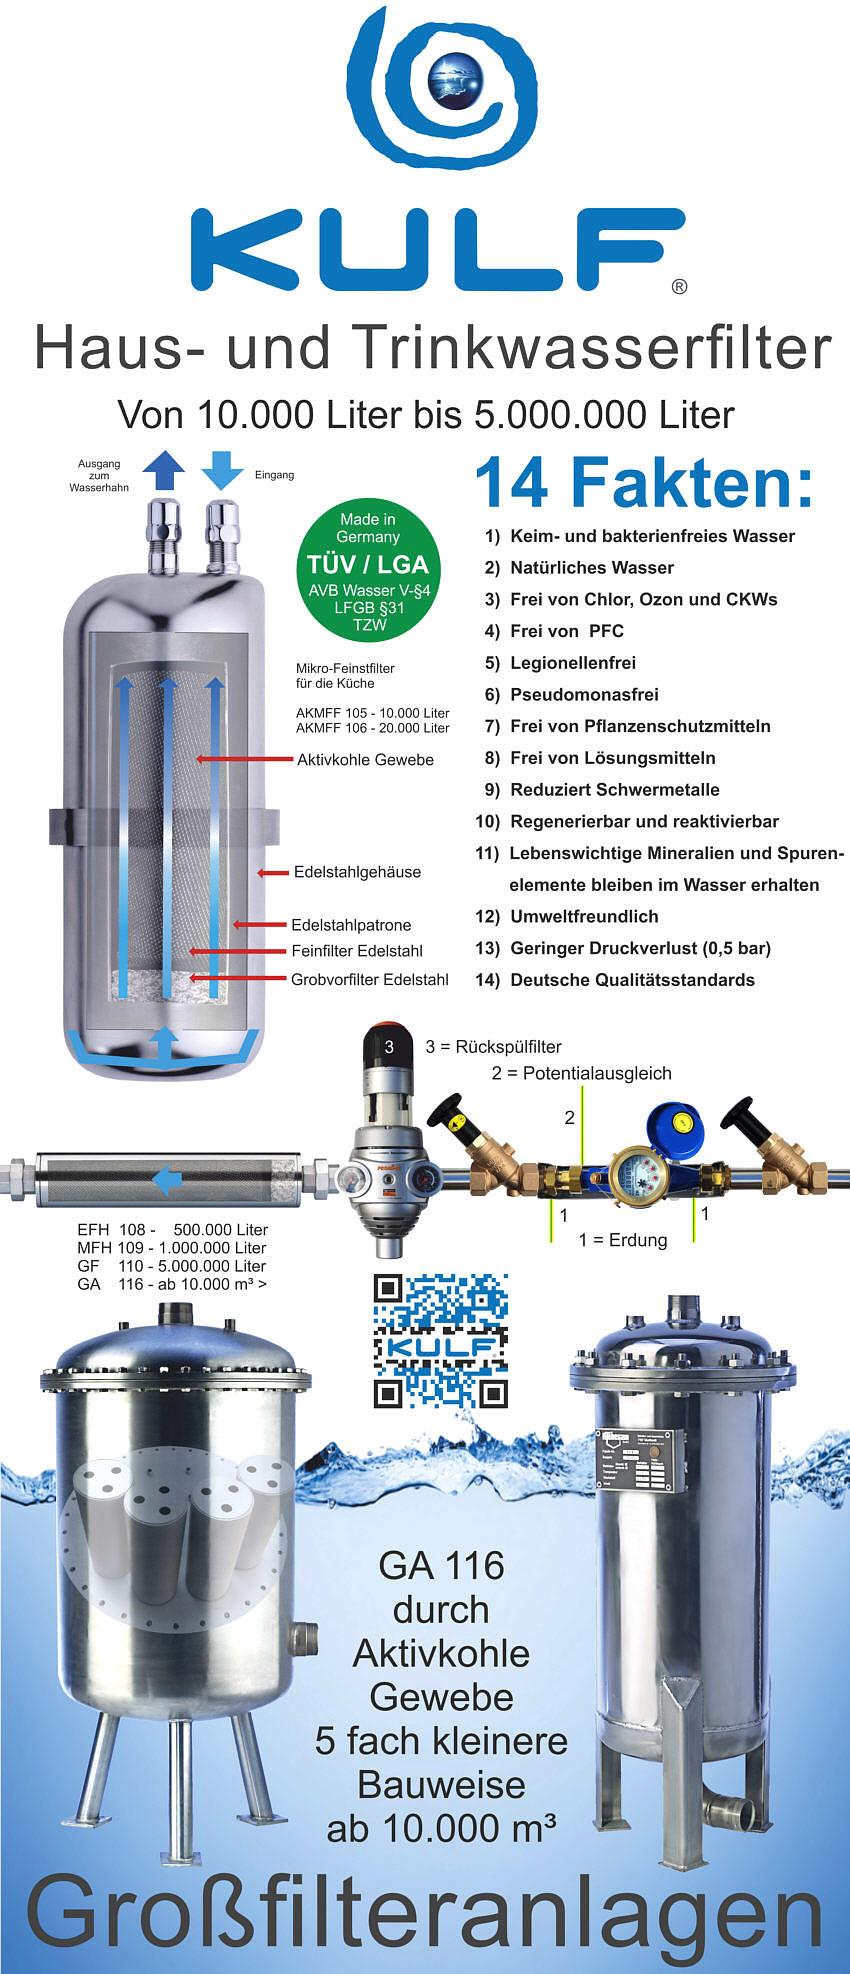 Kulf Wasserfilter Technologie Keimfrei Kohlefilter Edelstahl für ...